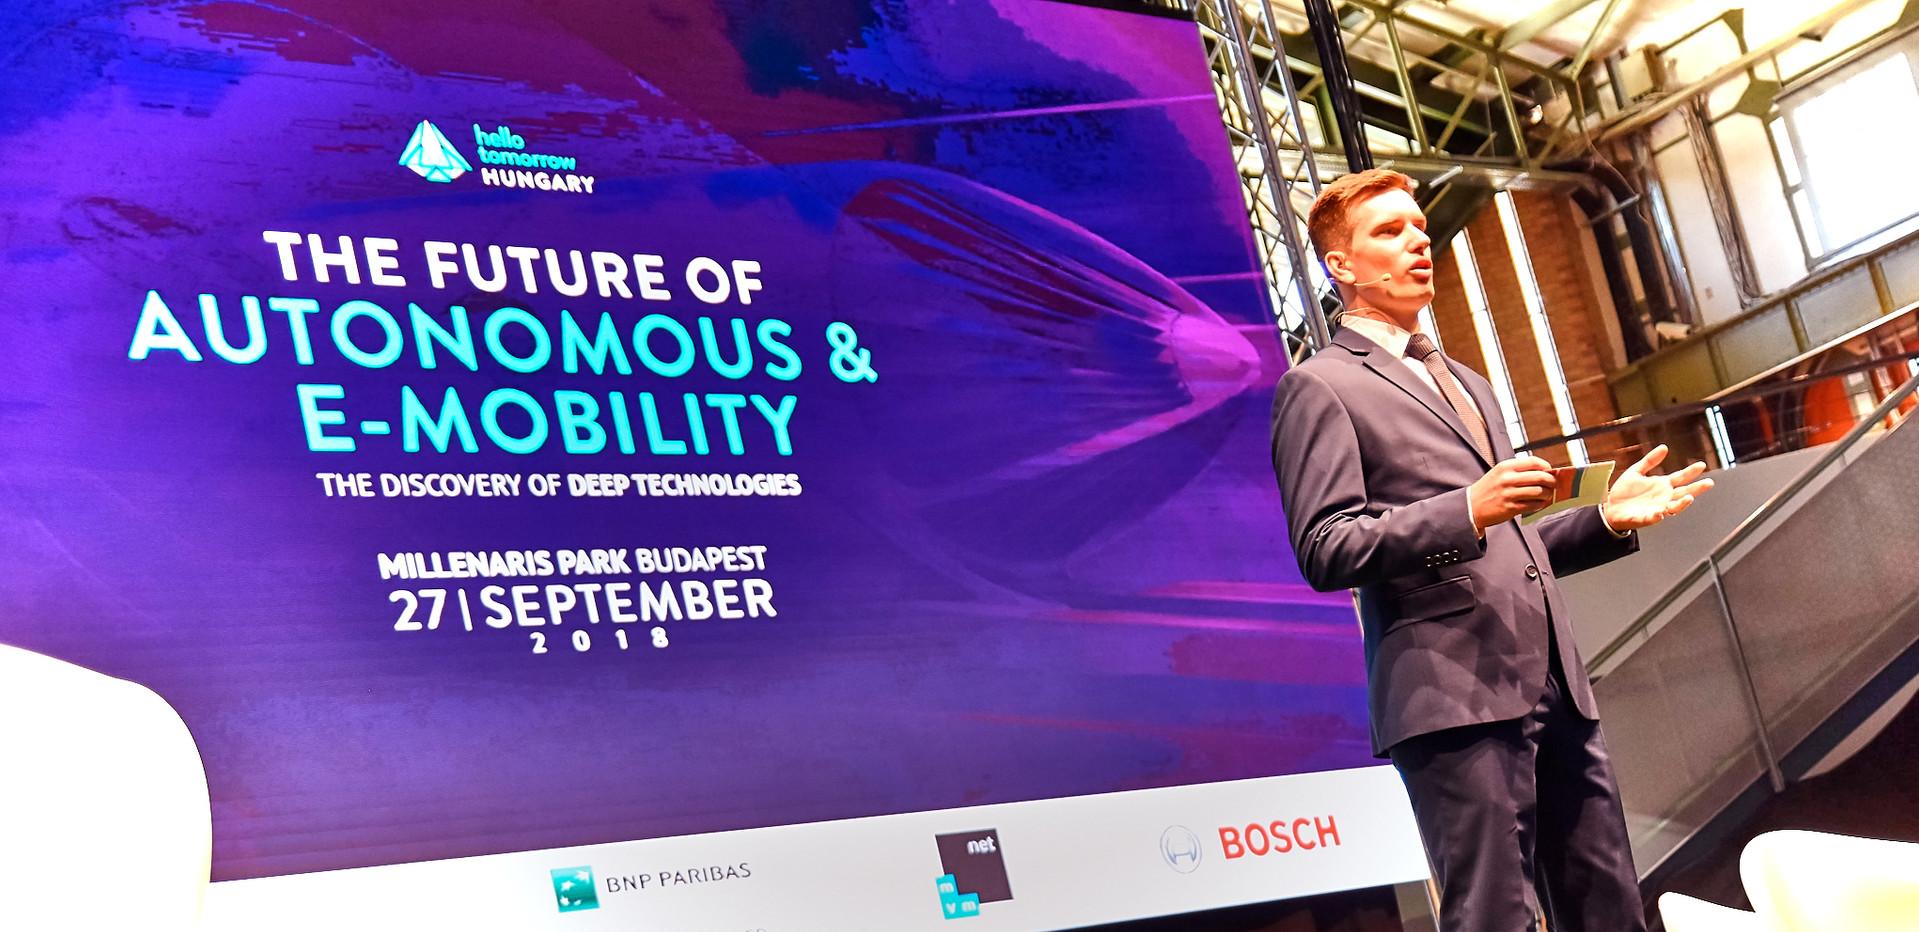 THE FUTURE OF AUTONOMOUS & E-MOBILITY